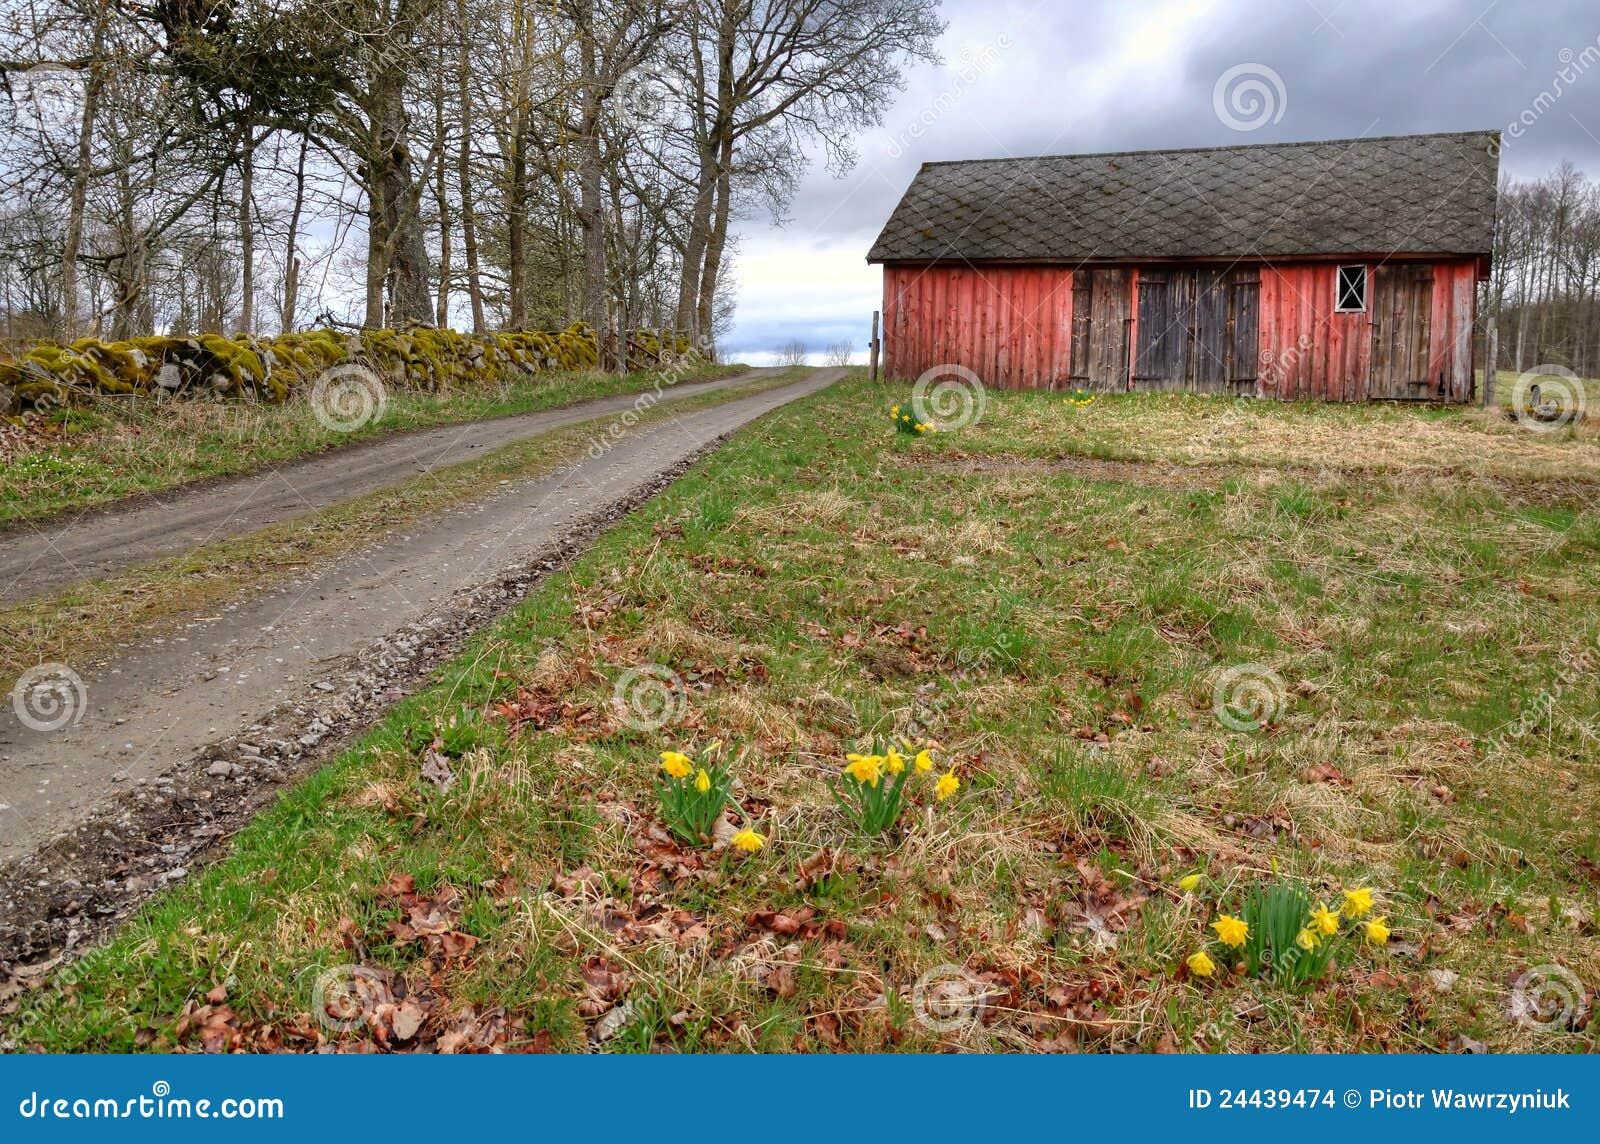 Swedish Village In Spring Season Stock Photo Image Of